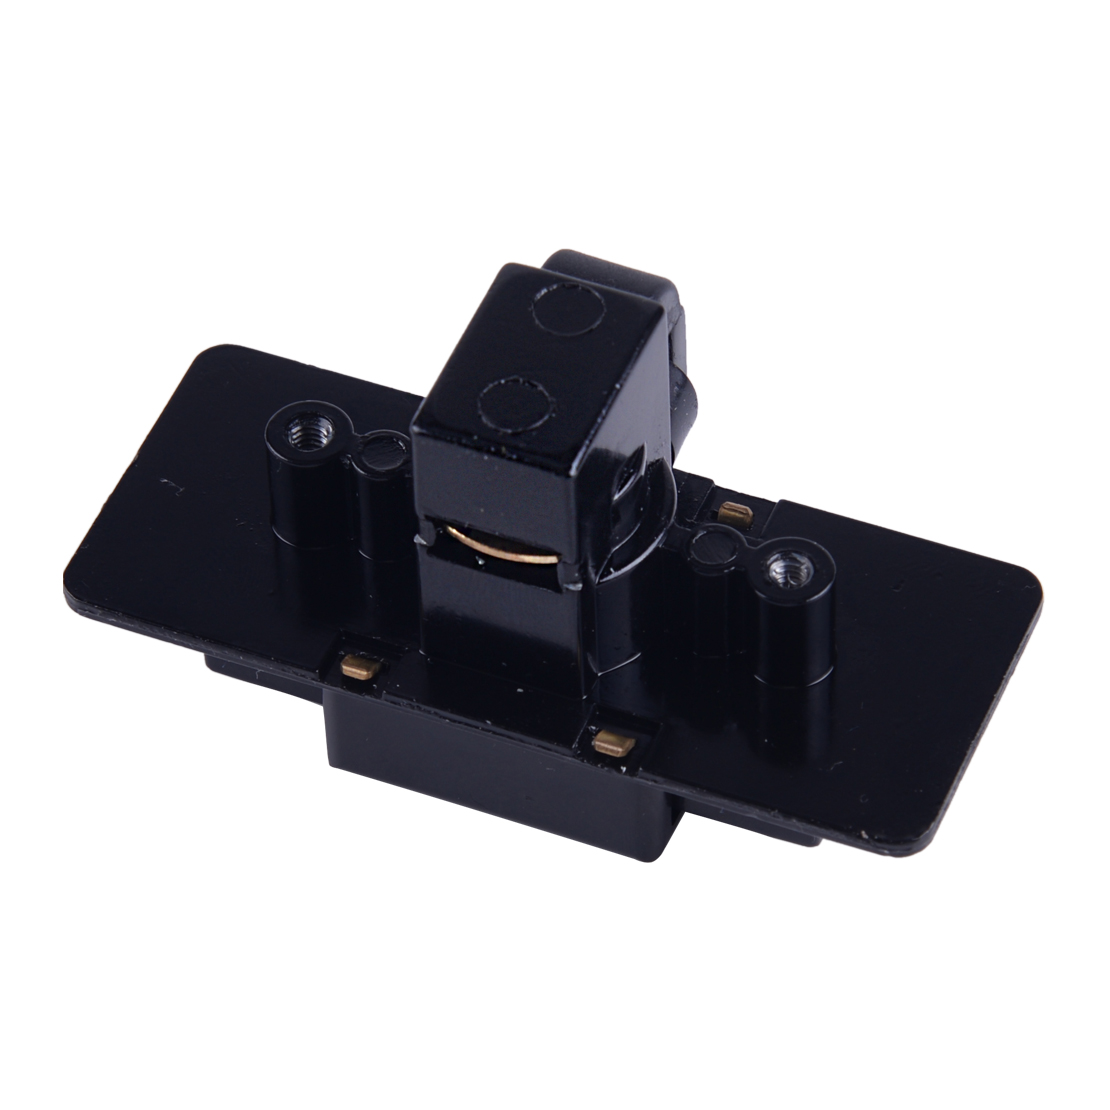 Glove Box Lock With Keys Fit Mitsubishi Pajero Montero V31 V32 V33 V43